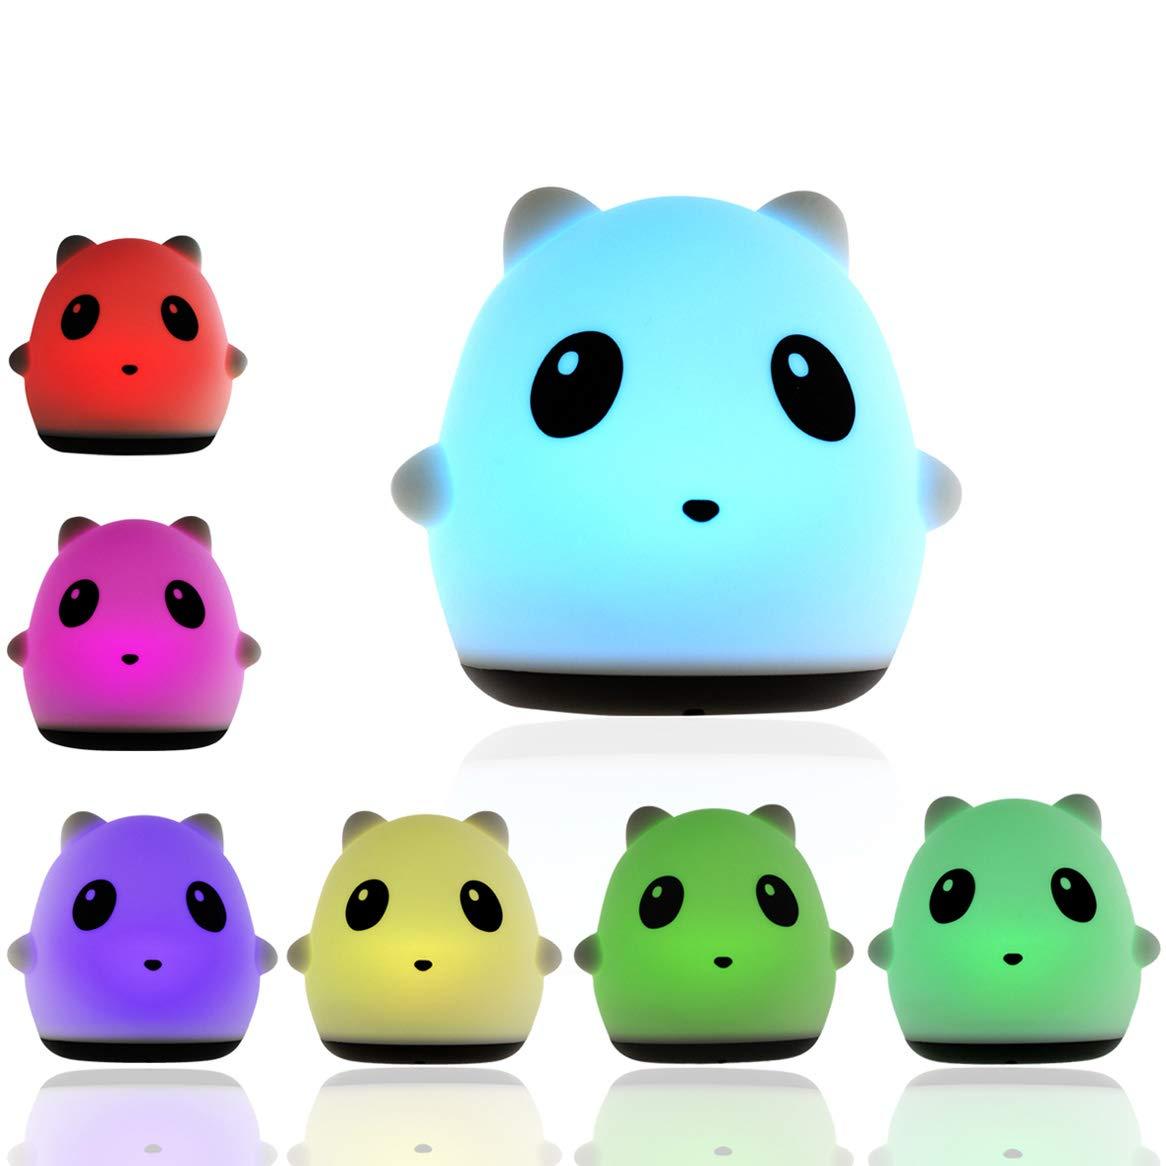 Cute Panda Nursery Night Light Multicolor Battery & USB Supply Baby Night Light Button Switch Infant Or Toddler Lamp Nursery Decor